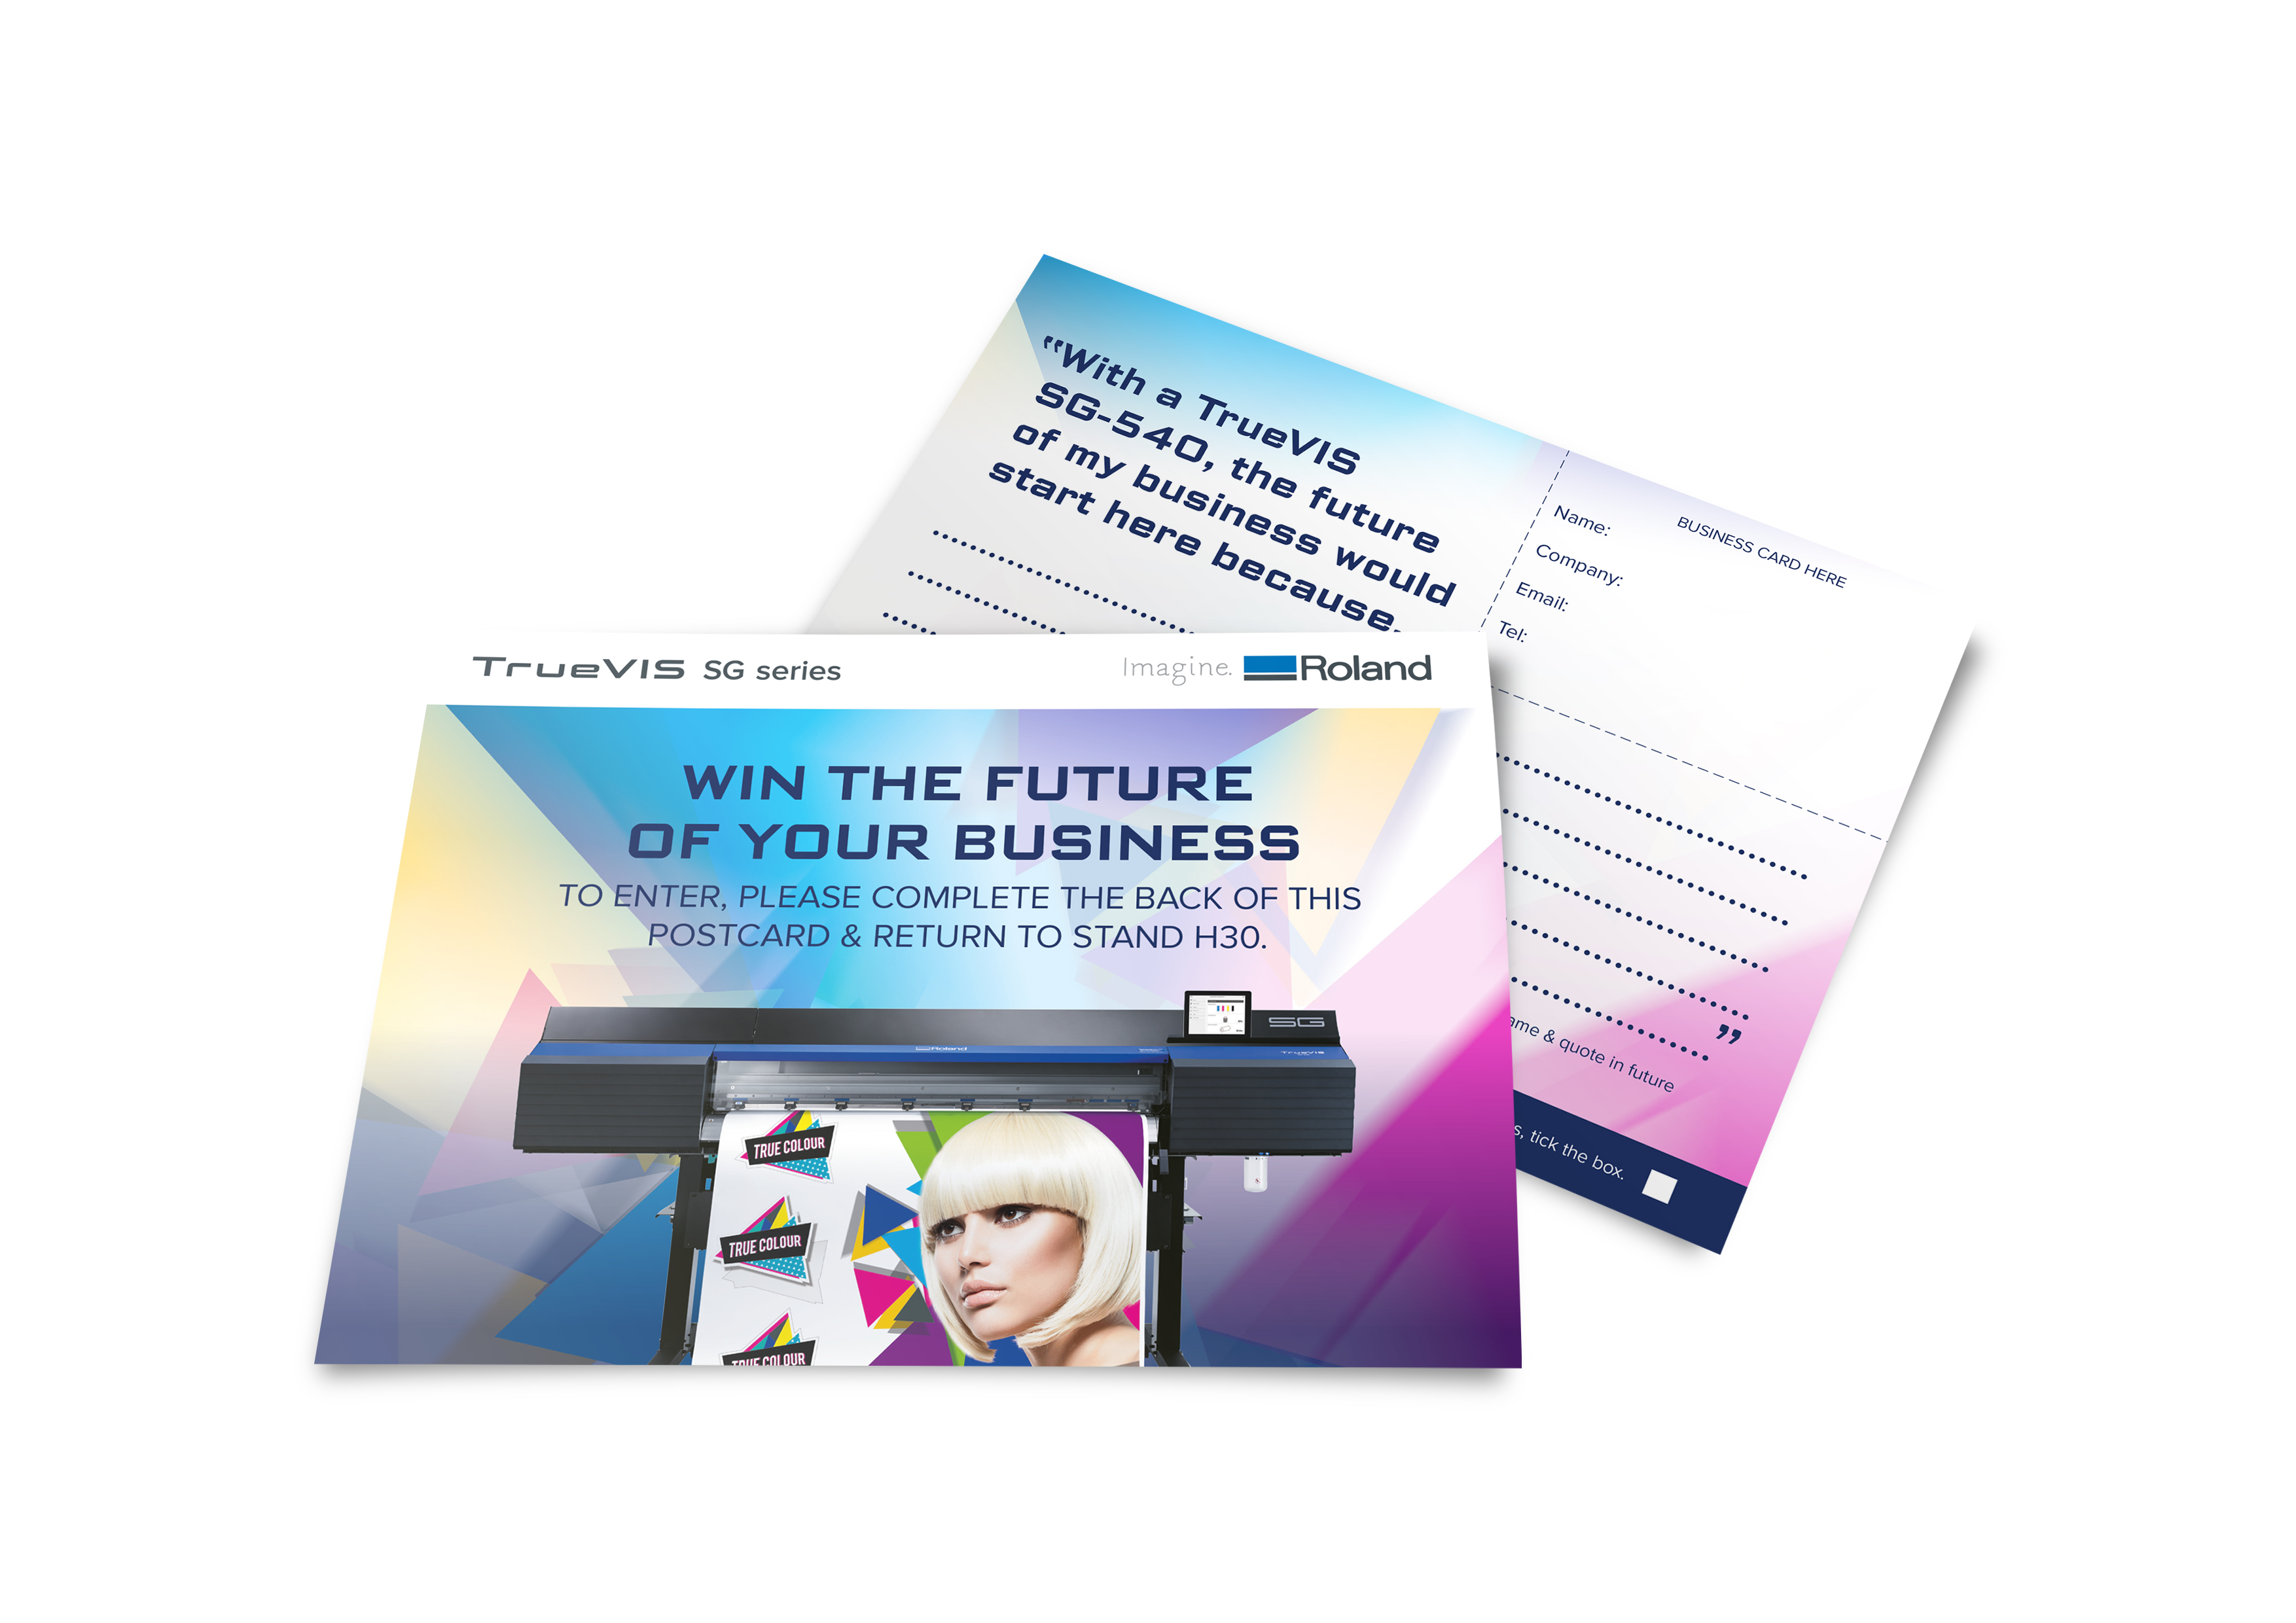 Roland DG - Win a TrueVis SG-540 - A5 Postcard